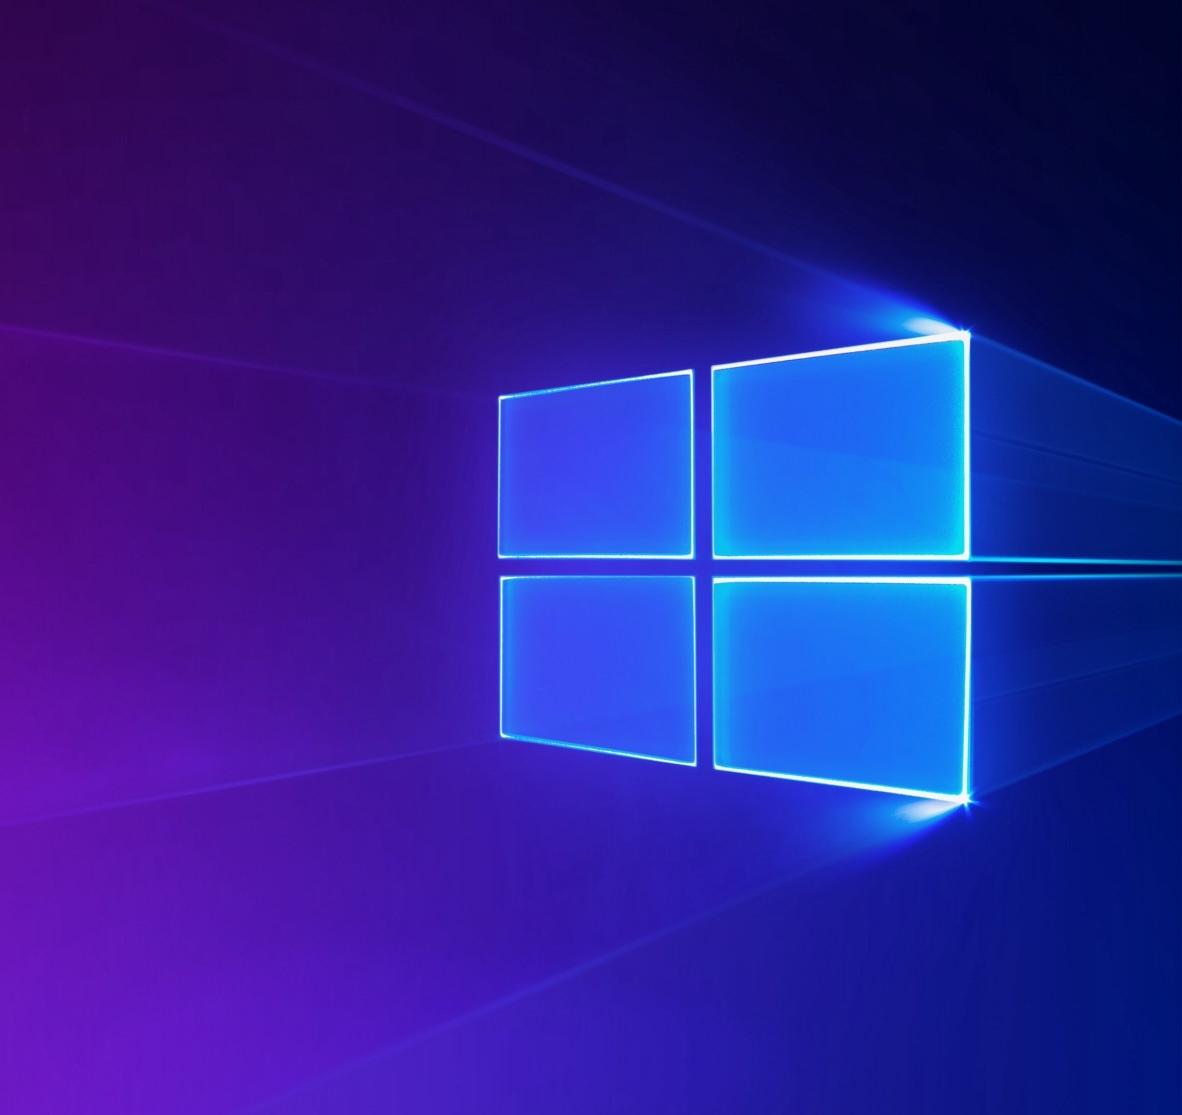 (GENUINE) ডাউনলোড করে ফেলুন Windows 10 October Update(লেটেস্ট ভার্সন). এর অরিজিনাল ISO ফাইল + যেকোন উইন্ডোজ এর জেনুইন ফাইল ডাউনলোড করার ট্রিকস । :-)